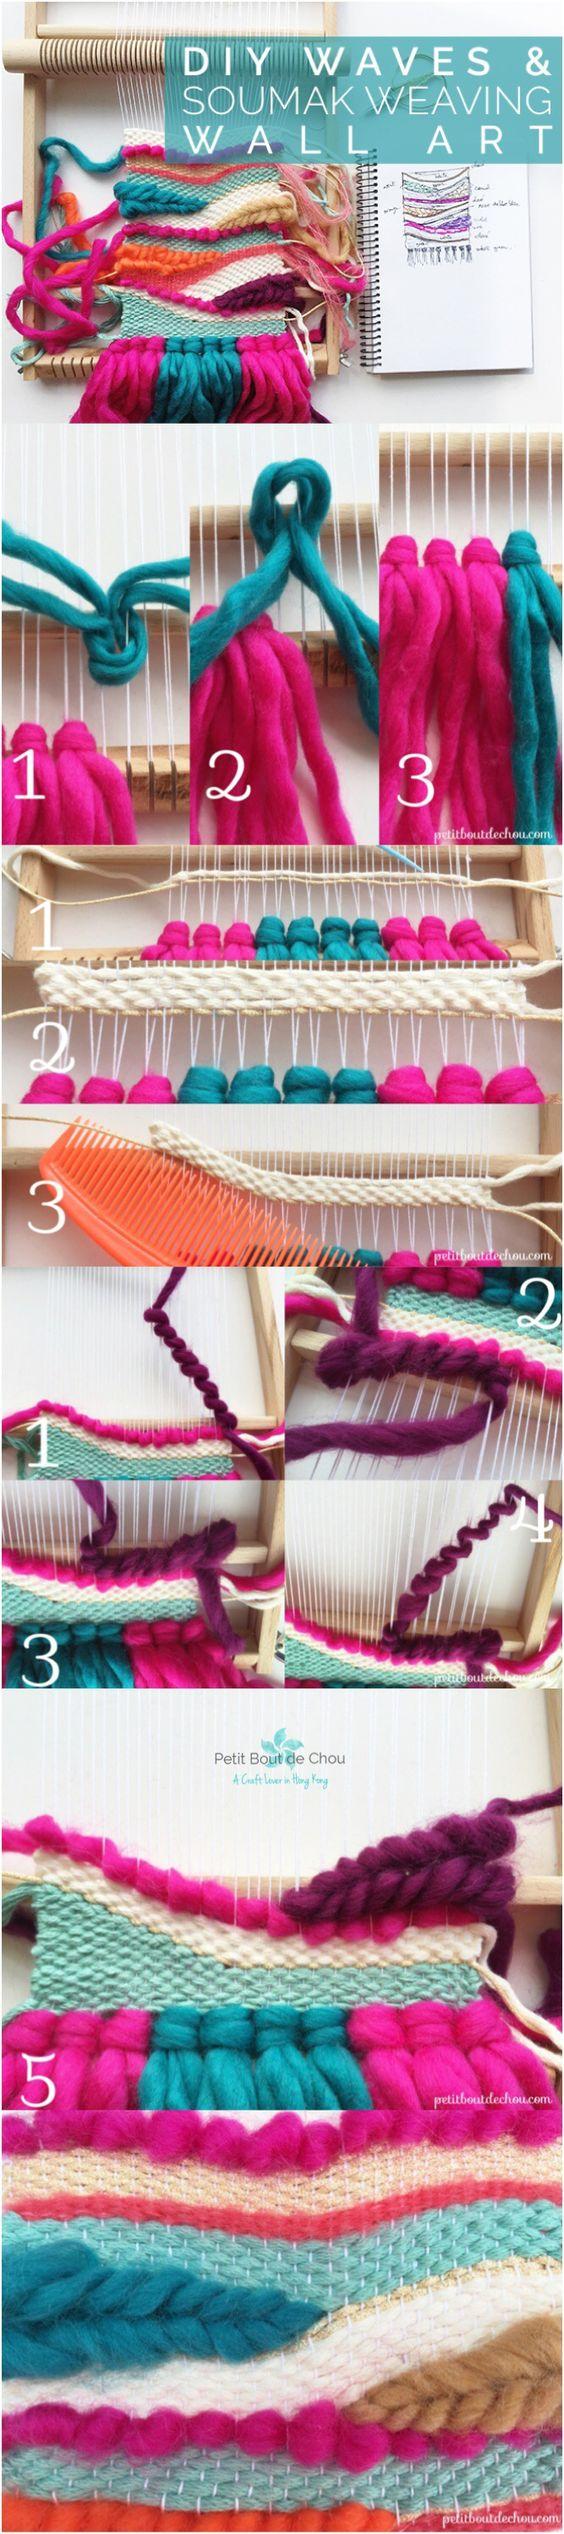 DIY Waves and Soumak Weaving Wall Art.